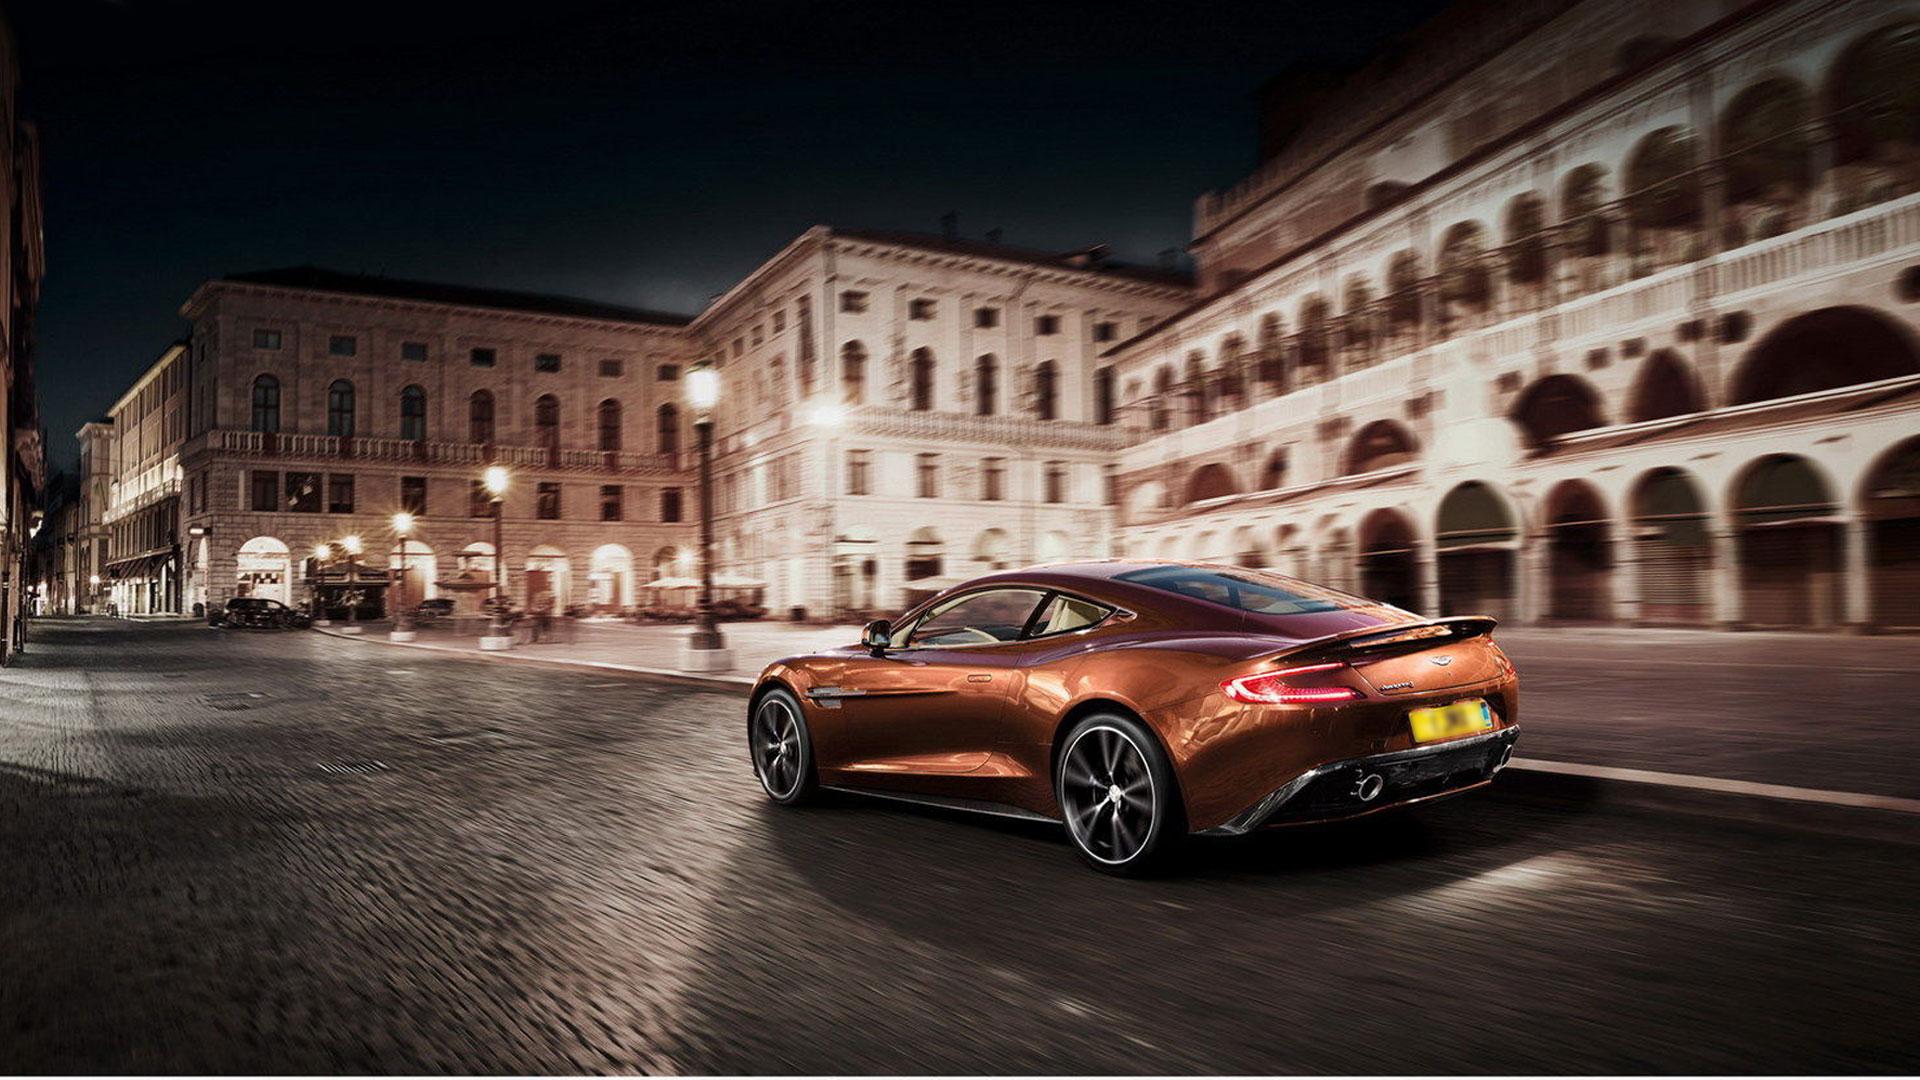 Aston Martin Vanquish v12 HD